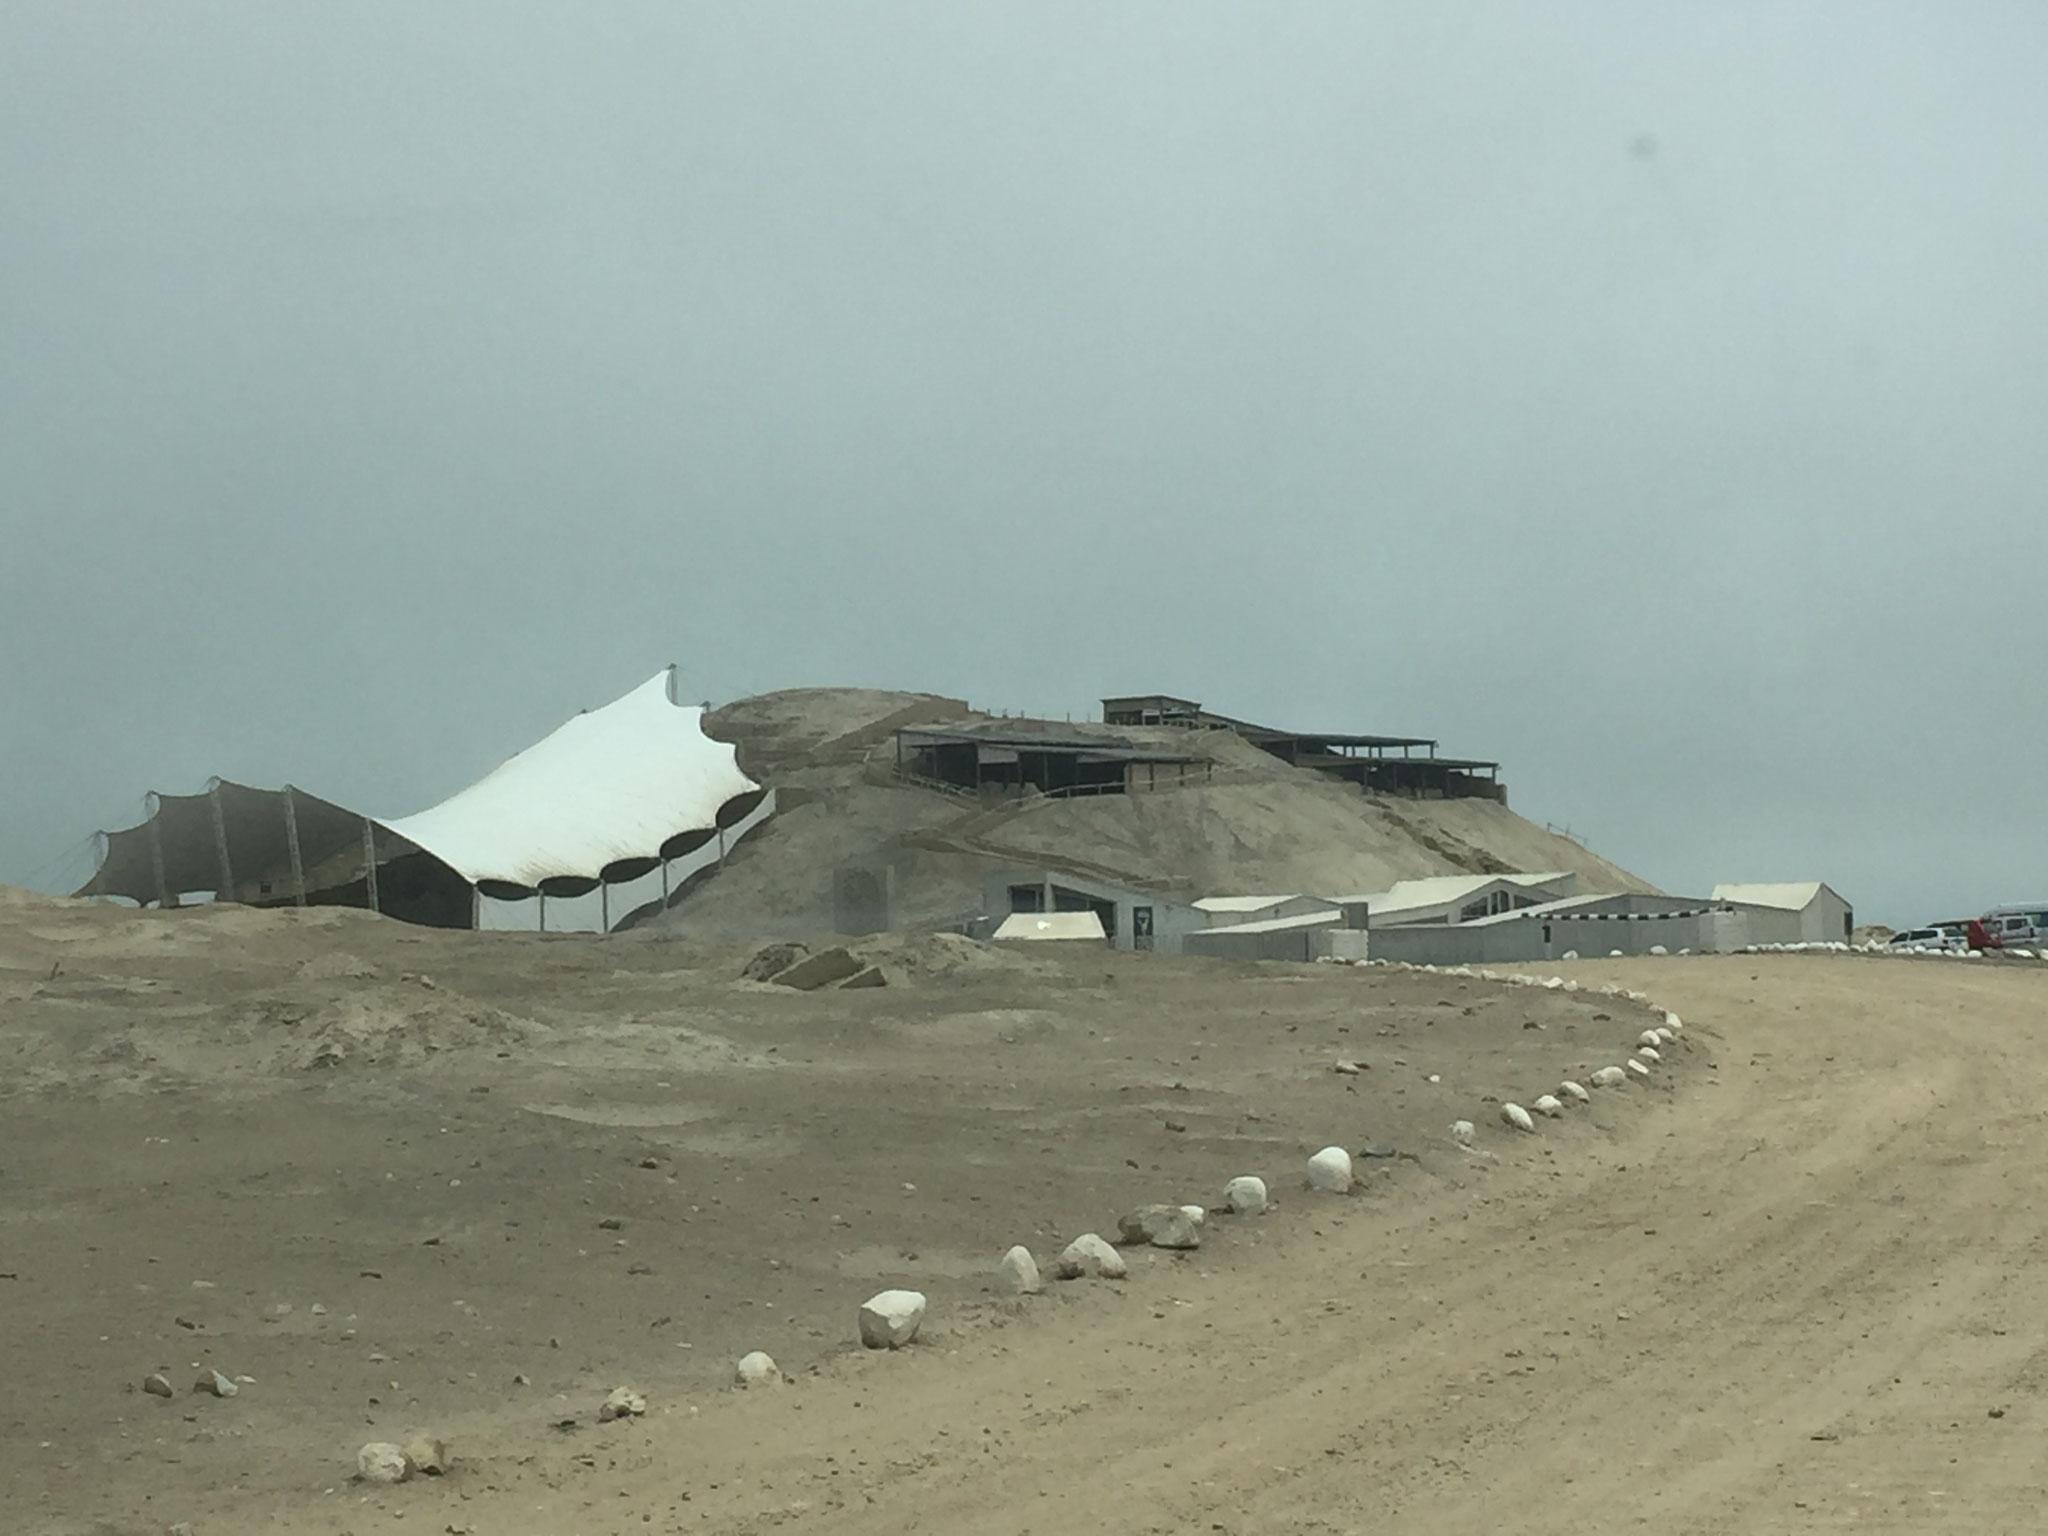 Pyramiden von El Brujo mit ......